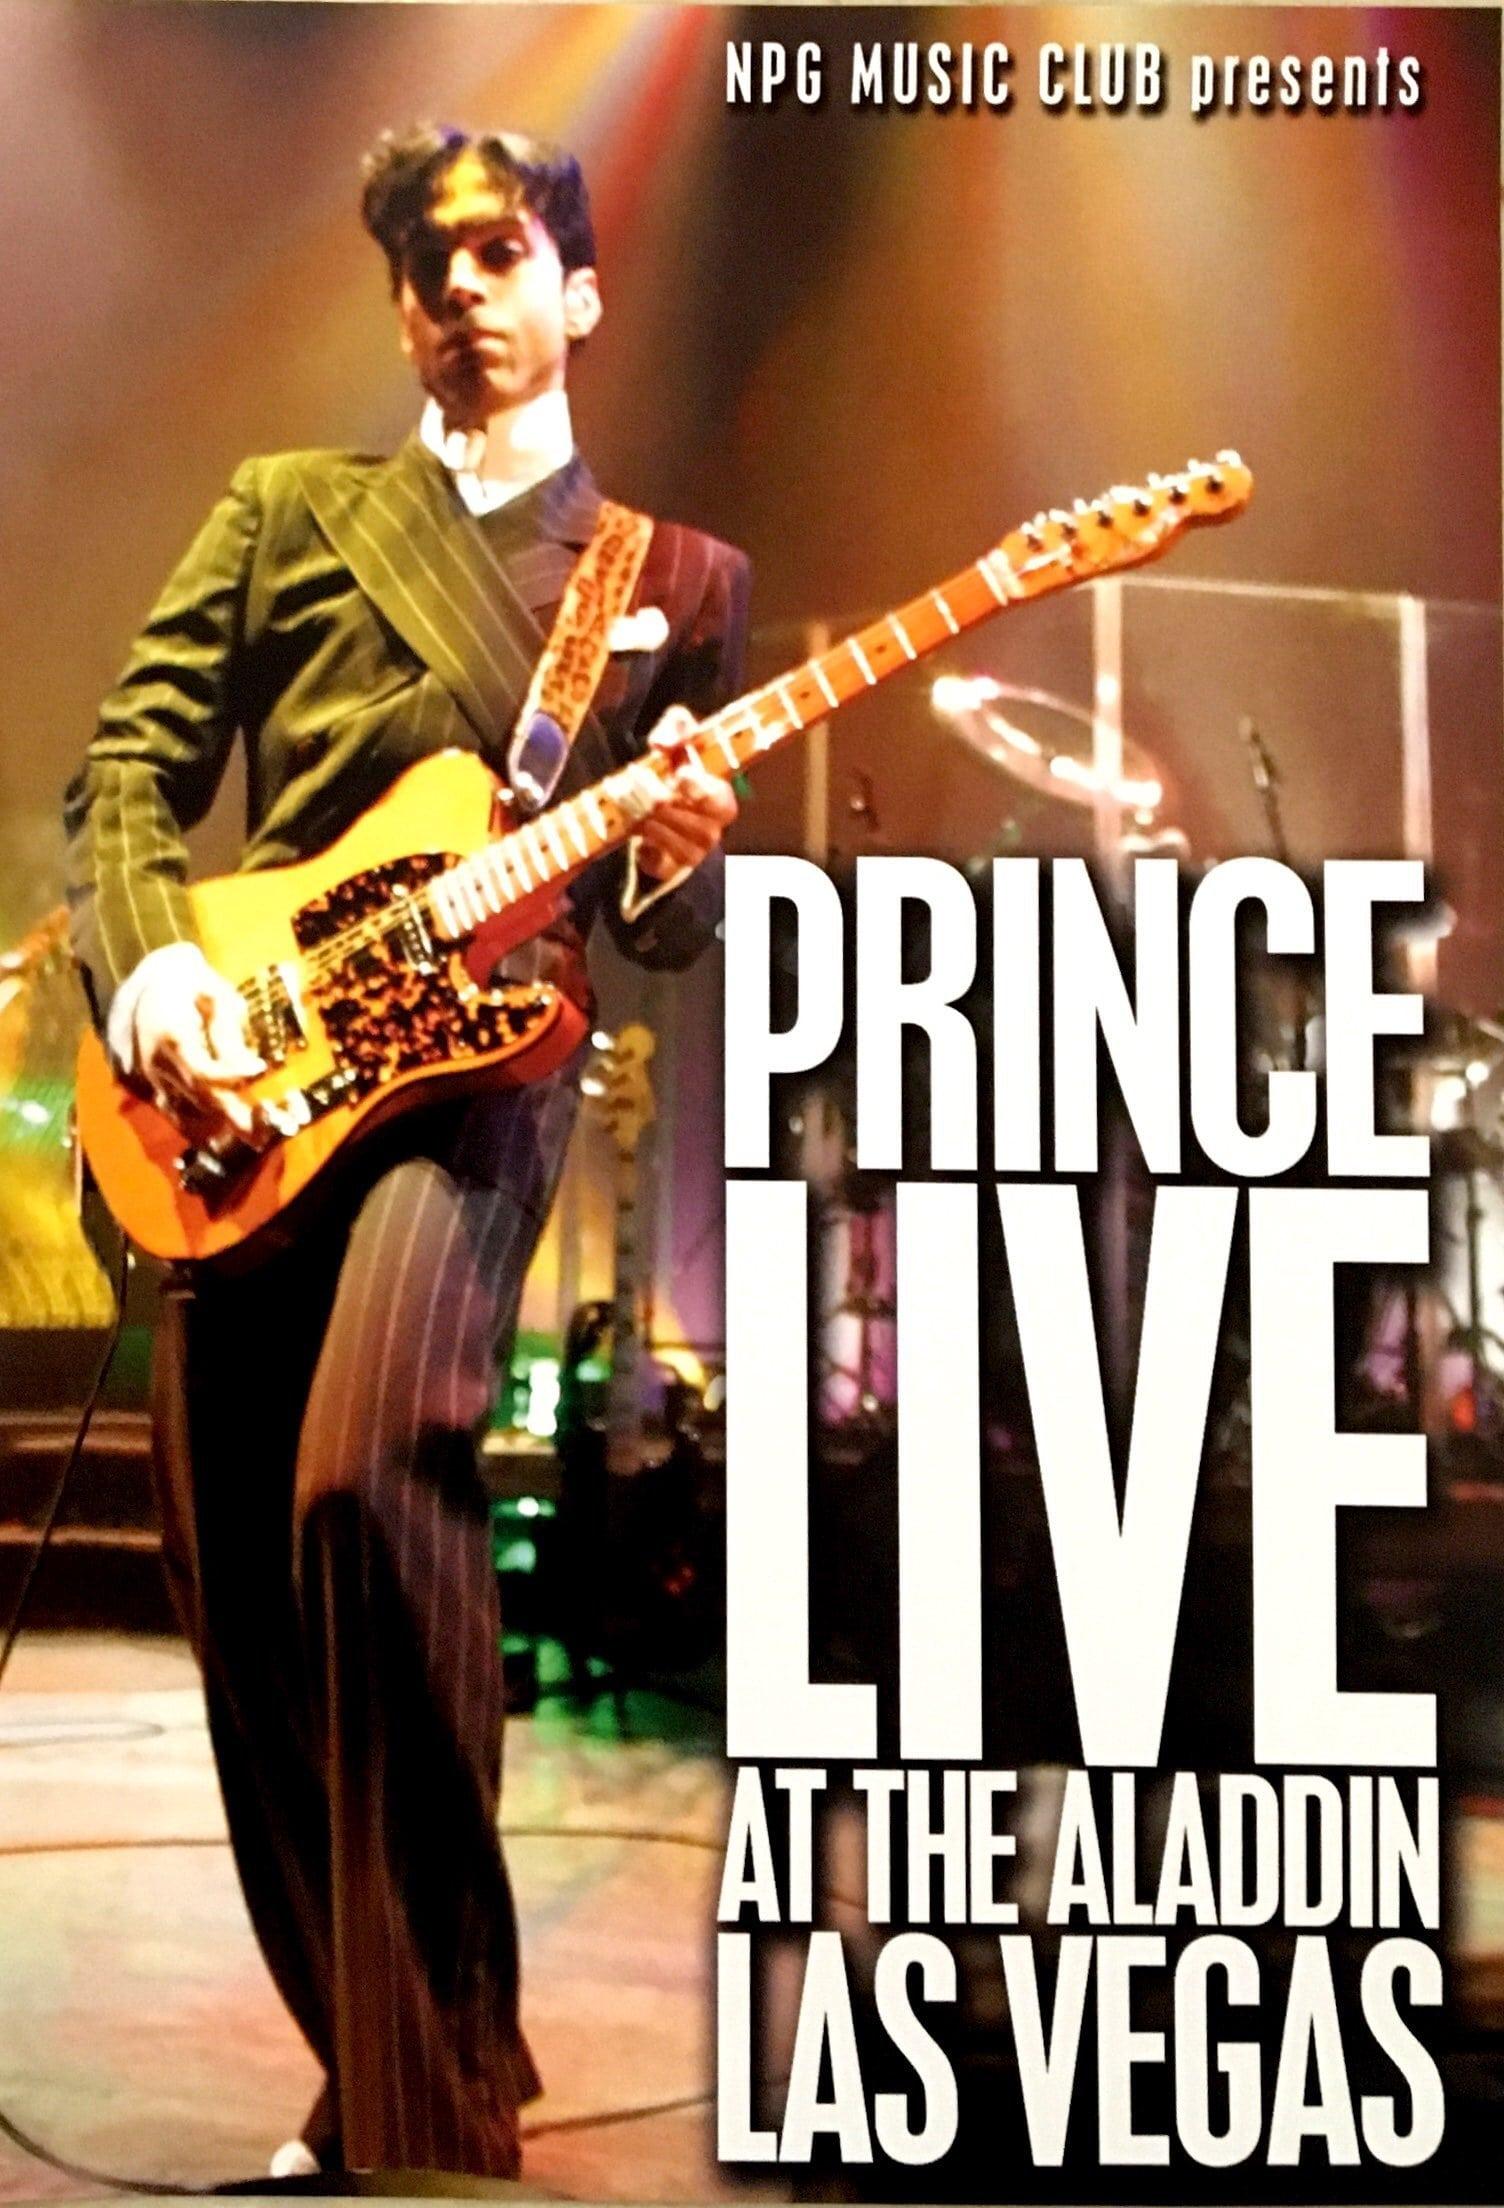 Prince: Live at the Aladdin Las Vegas (2003)